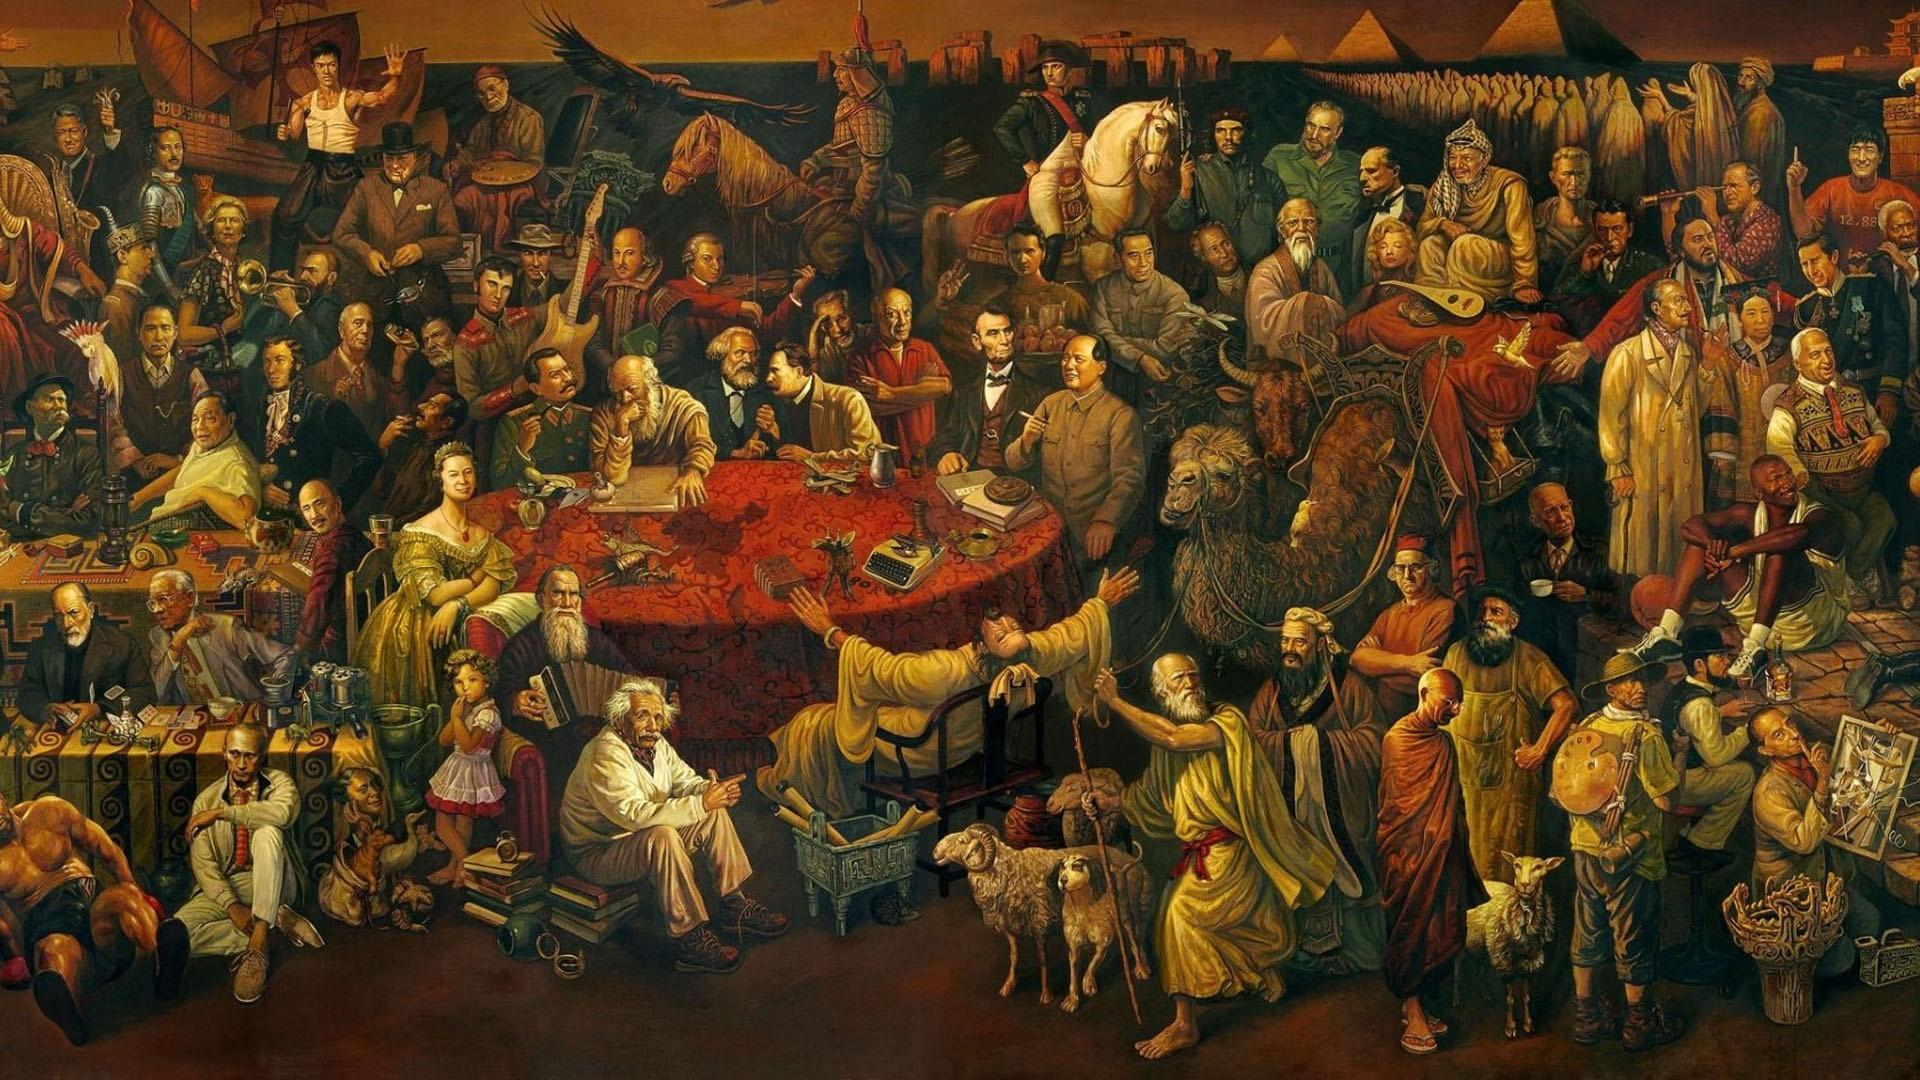 General celebrity Discussing the Divine Comedy with Dante Salvador  Dalí artwork painting Socrates Vladimir Lenin